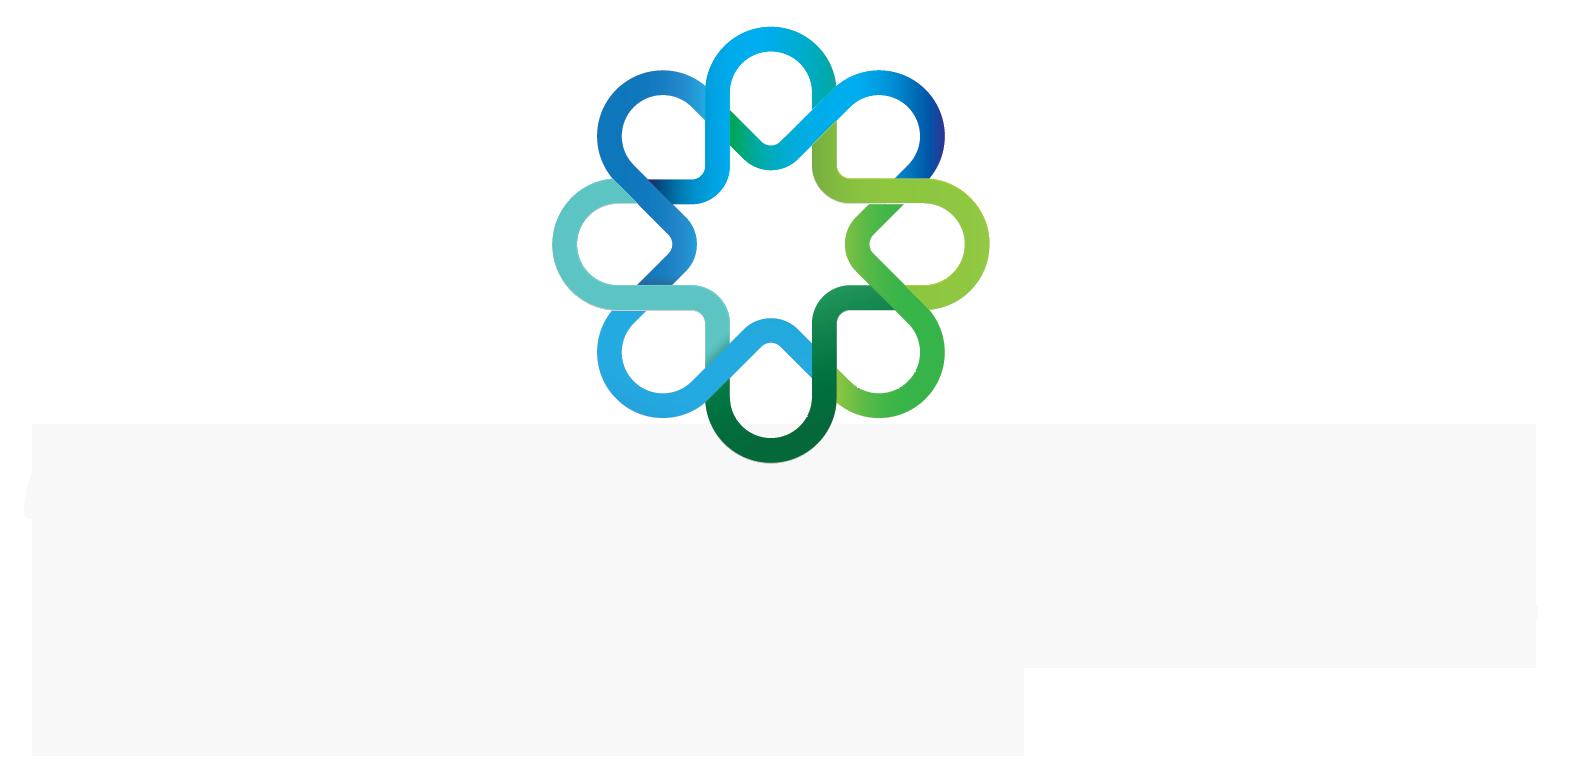 Mozgunk.hu